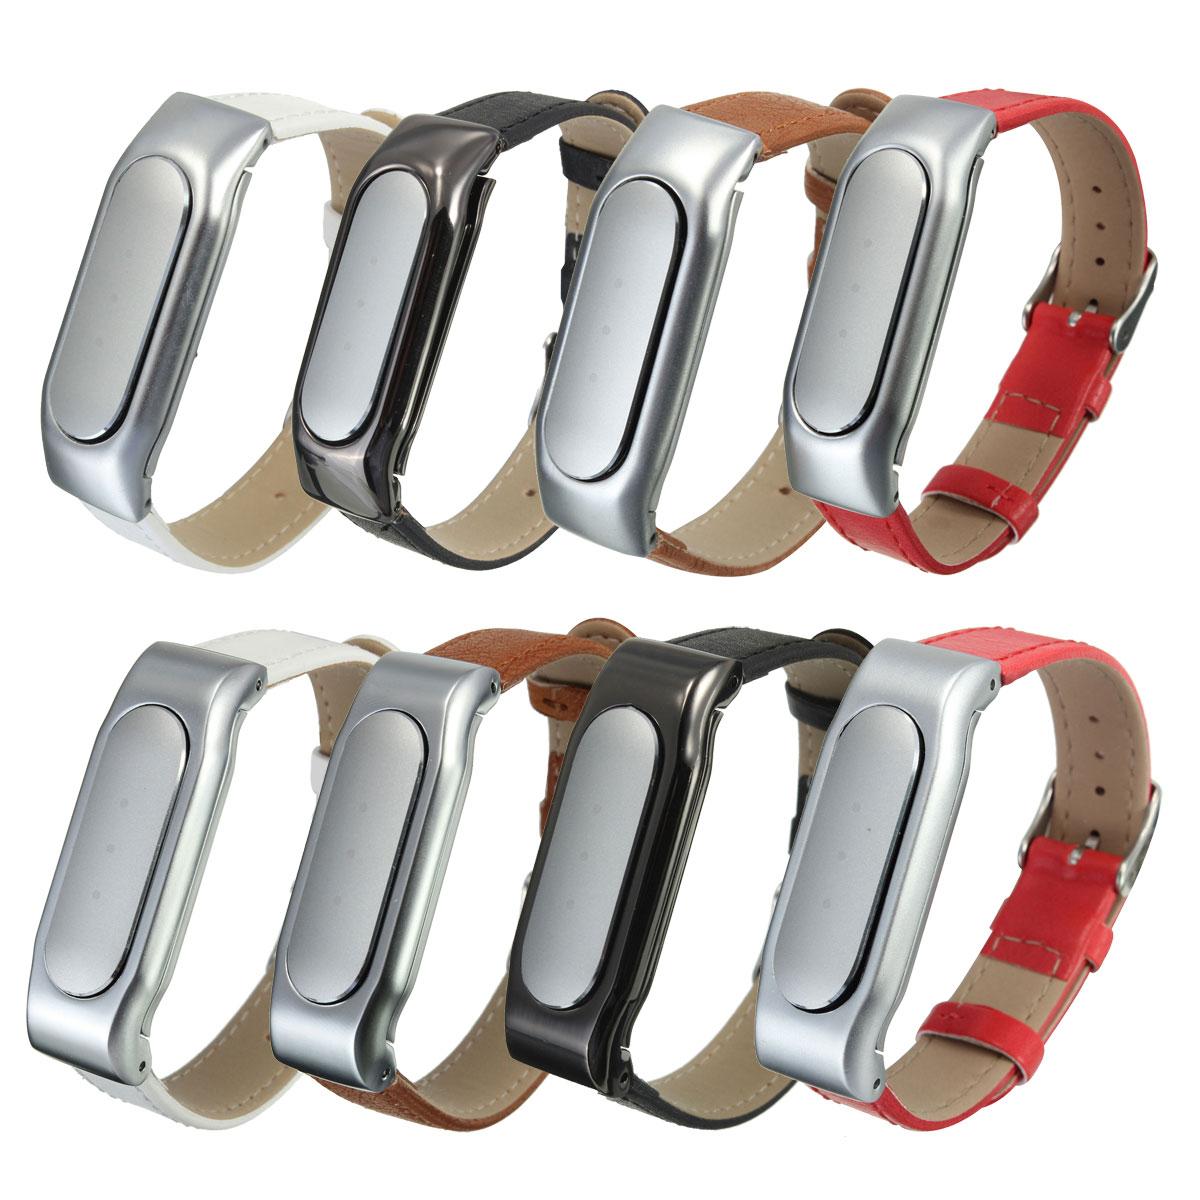 PU Leather Replacement Wristband Wrist Strap Bracelet For Xiaomi Mi Band 1S